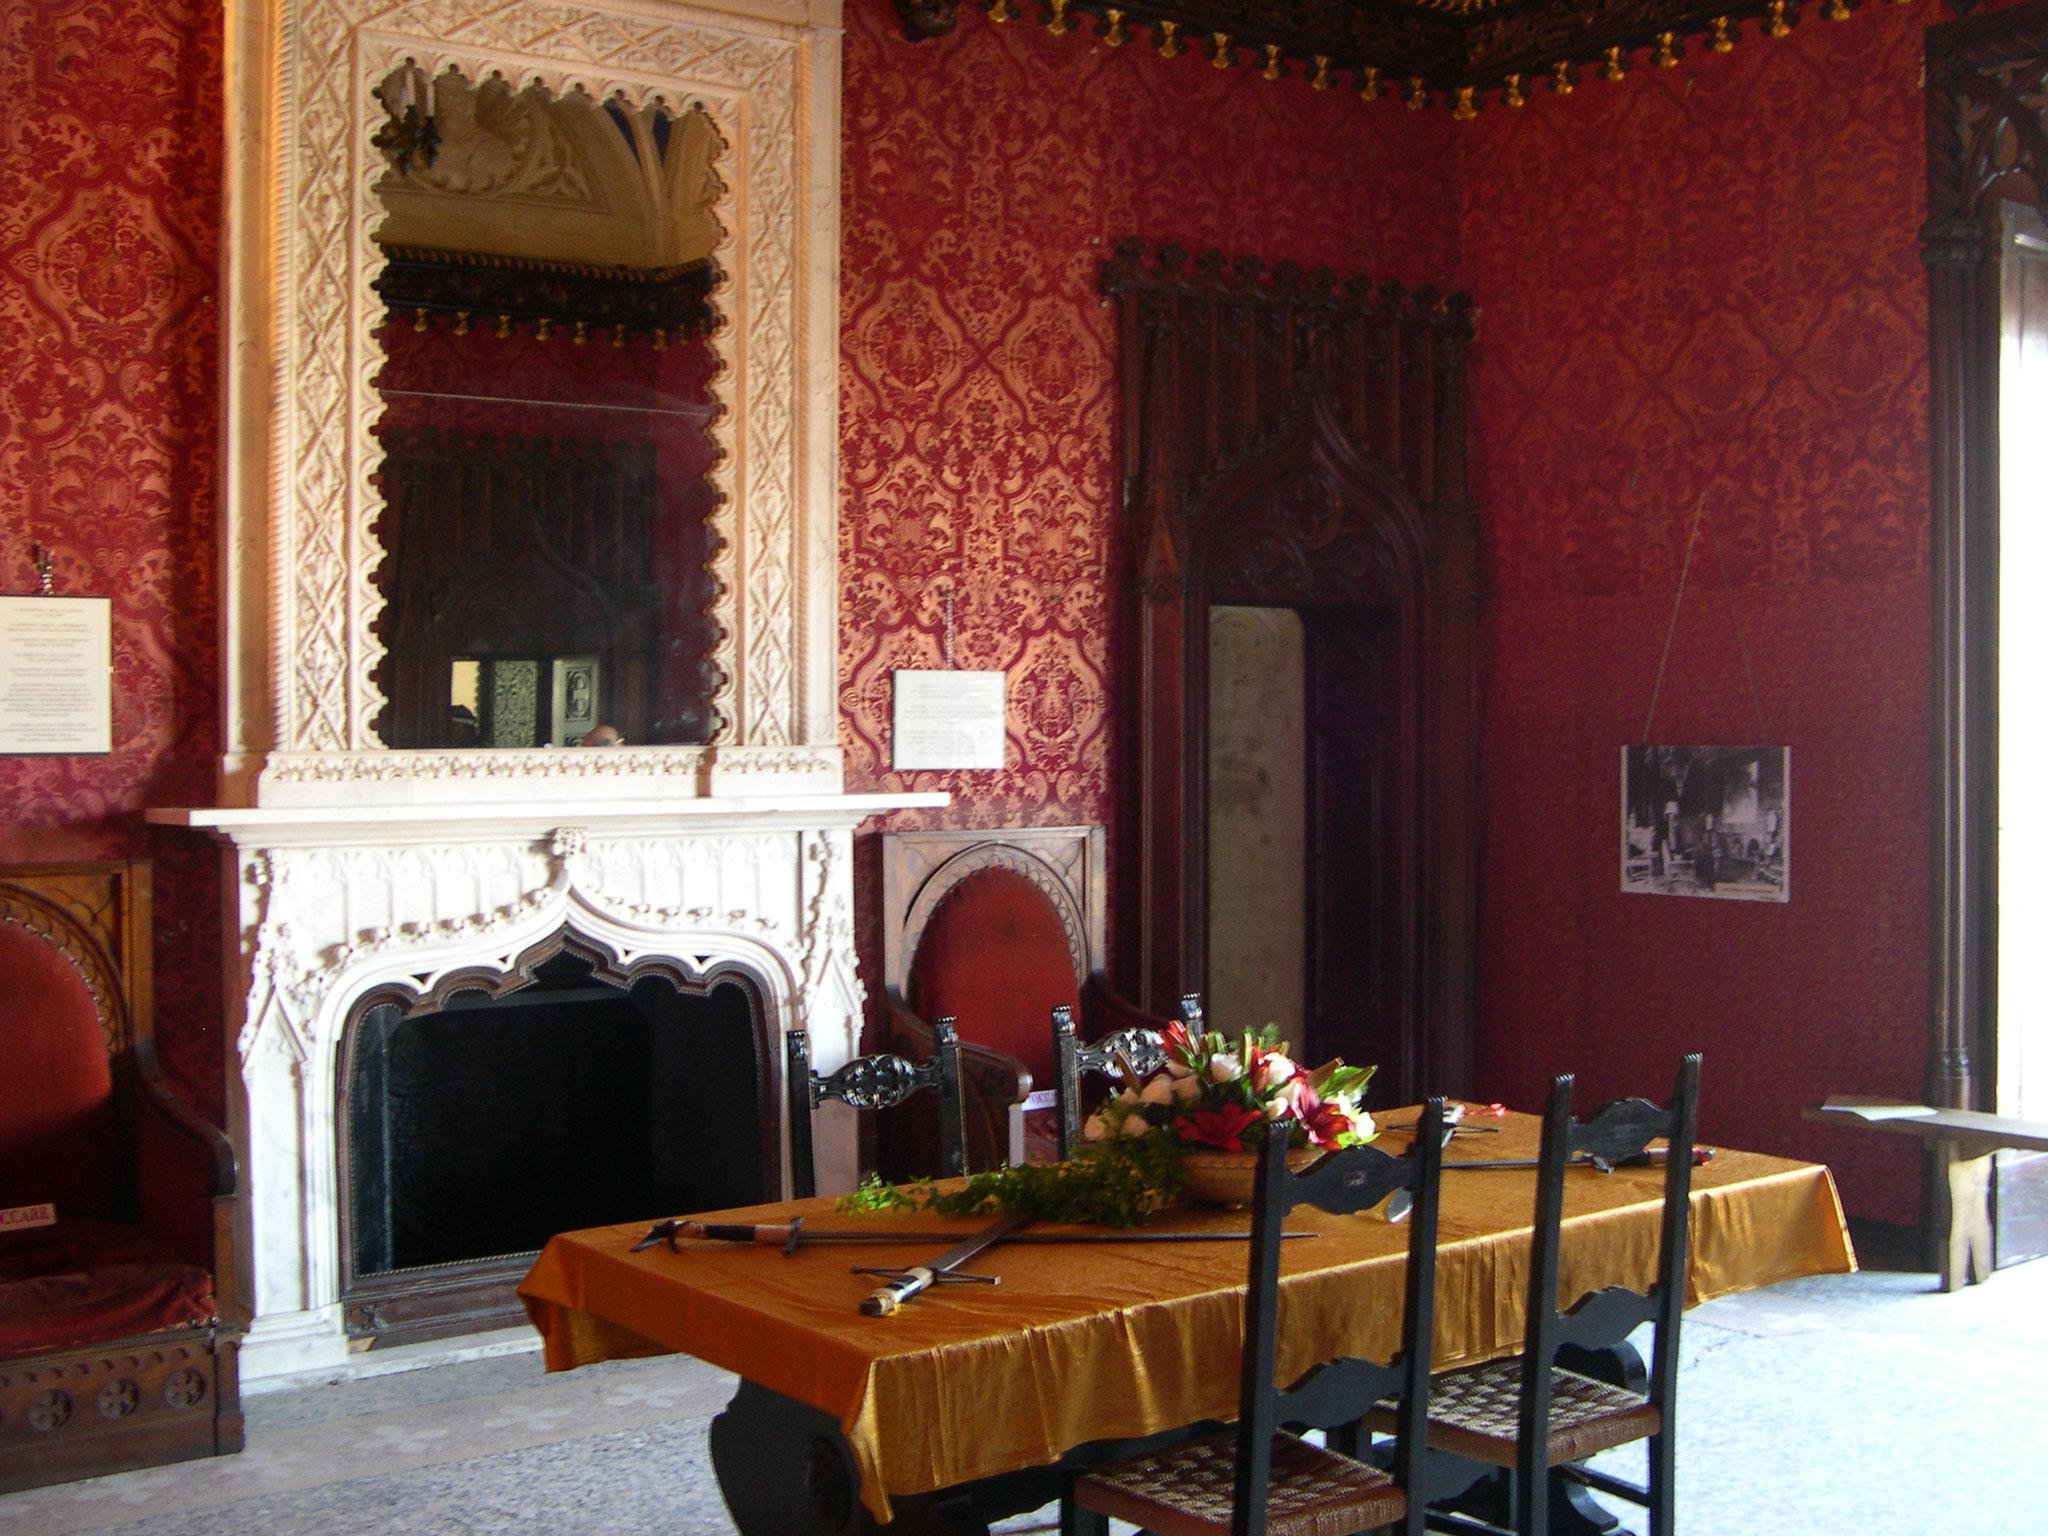 La Sala Rossa